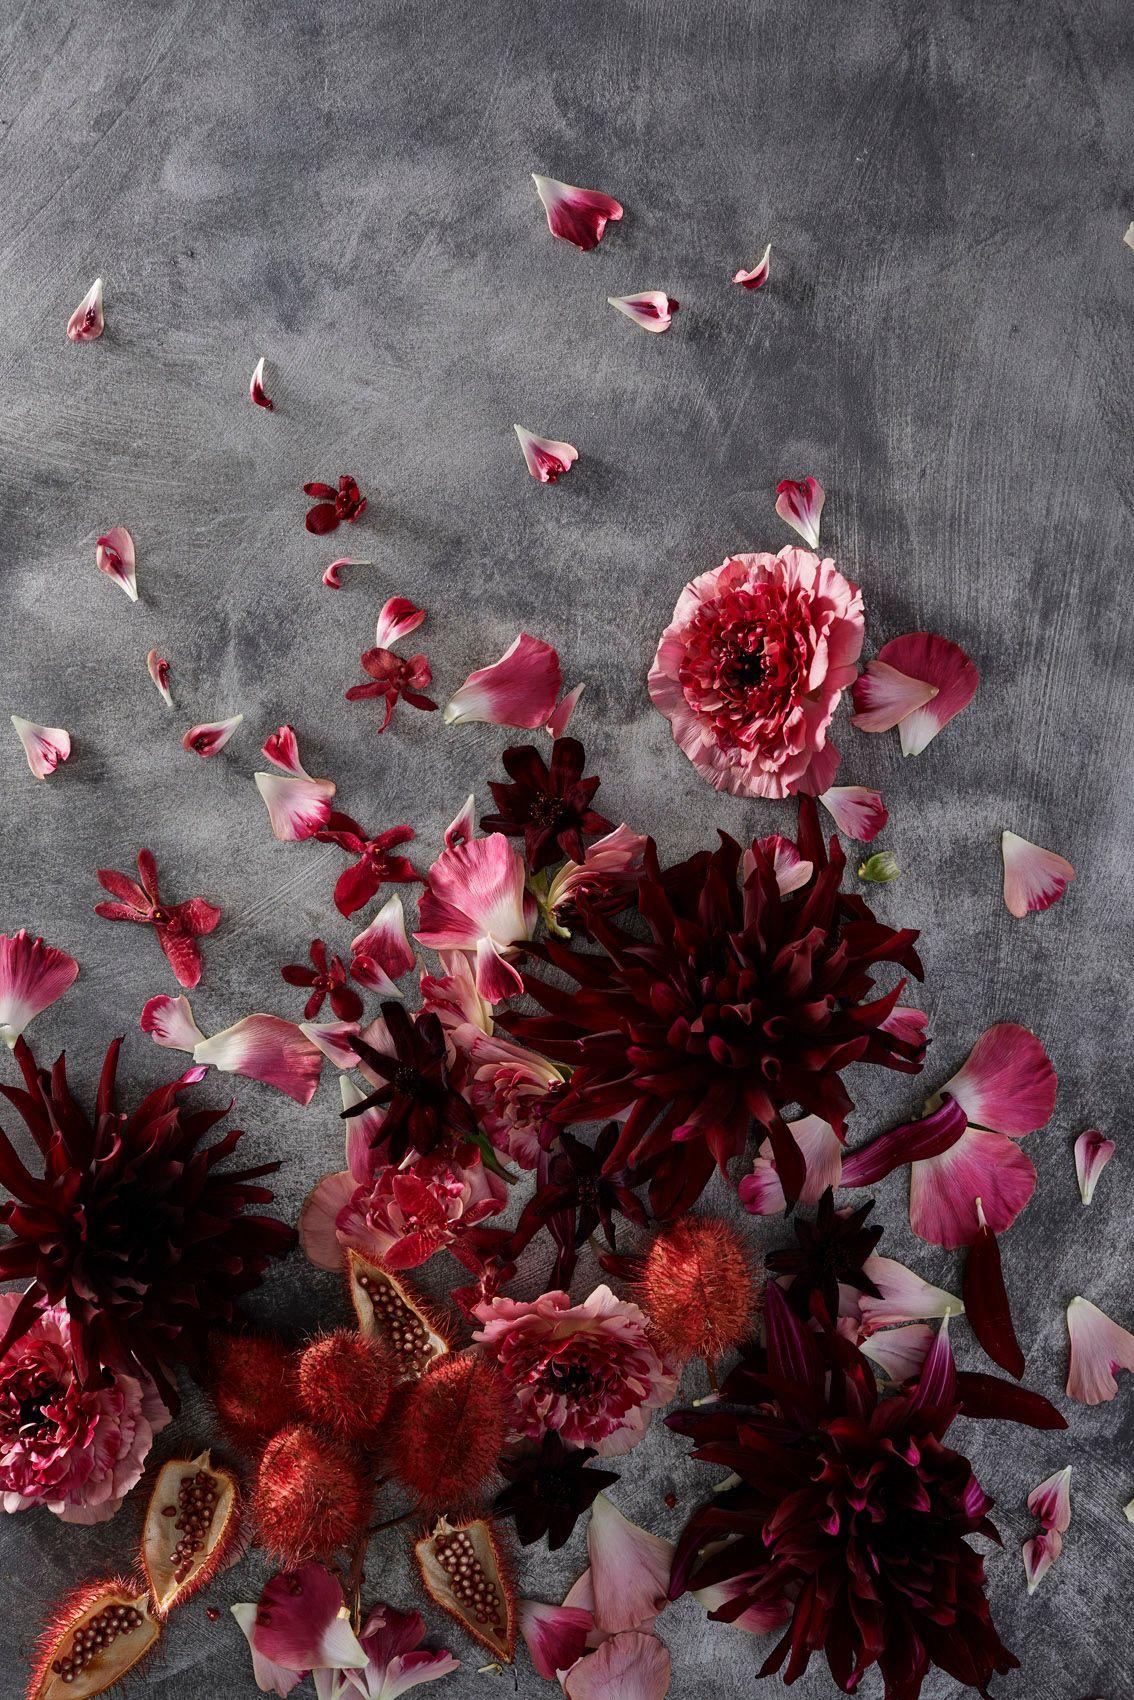 ChristopherWhite_Floral Study_2.jpg